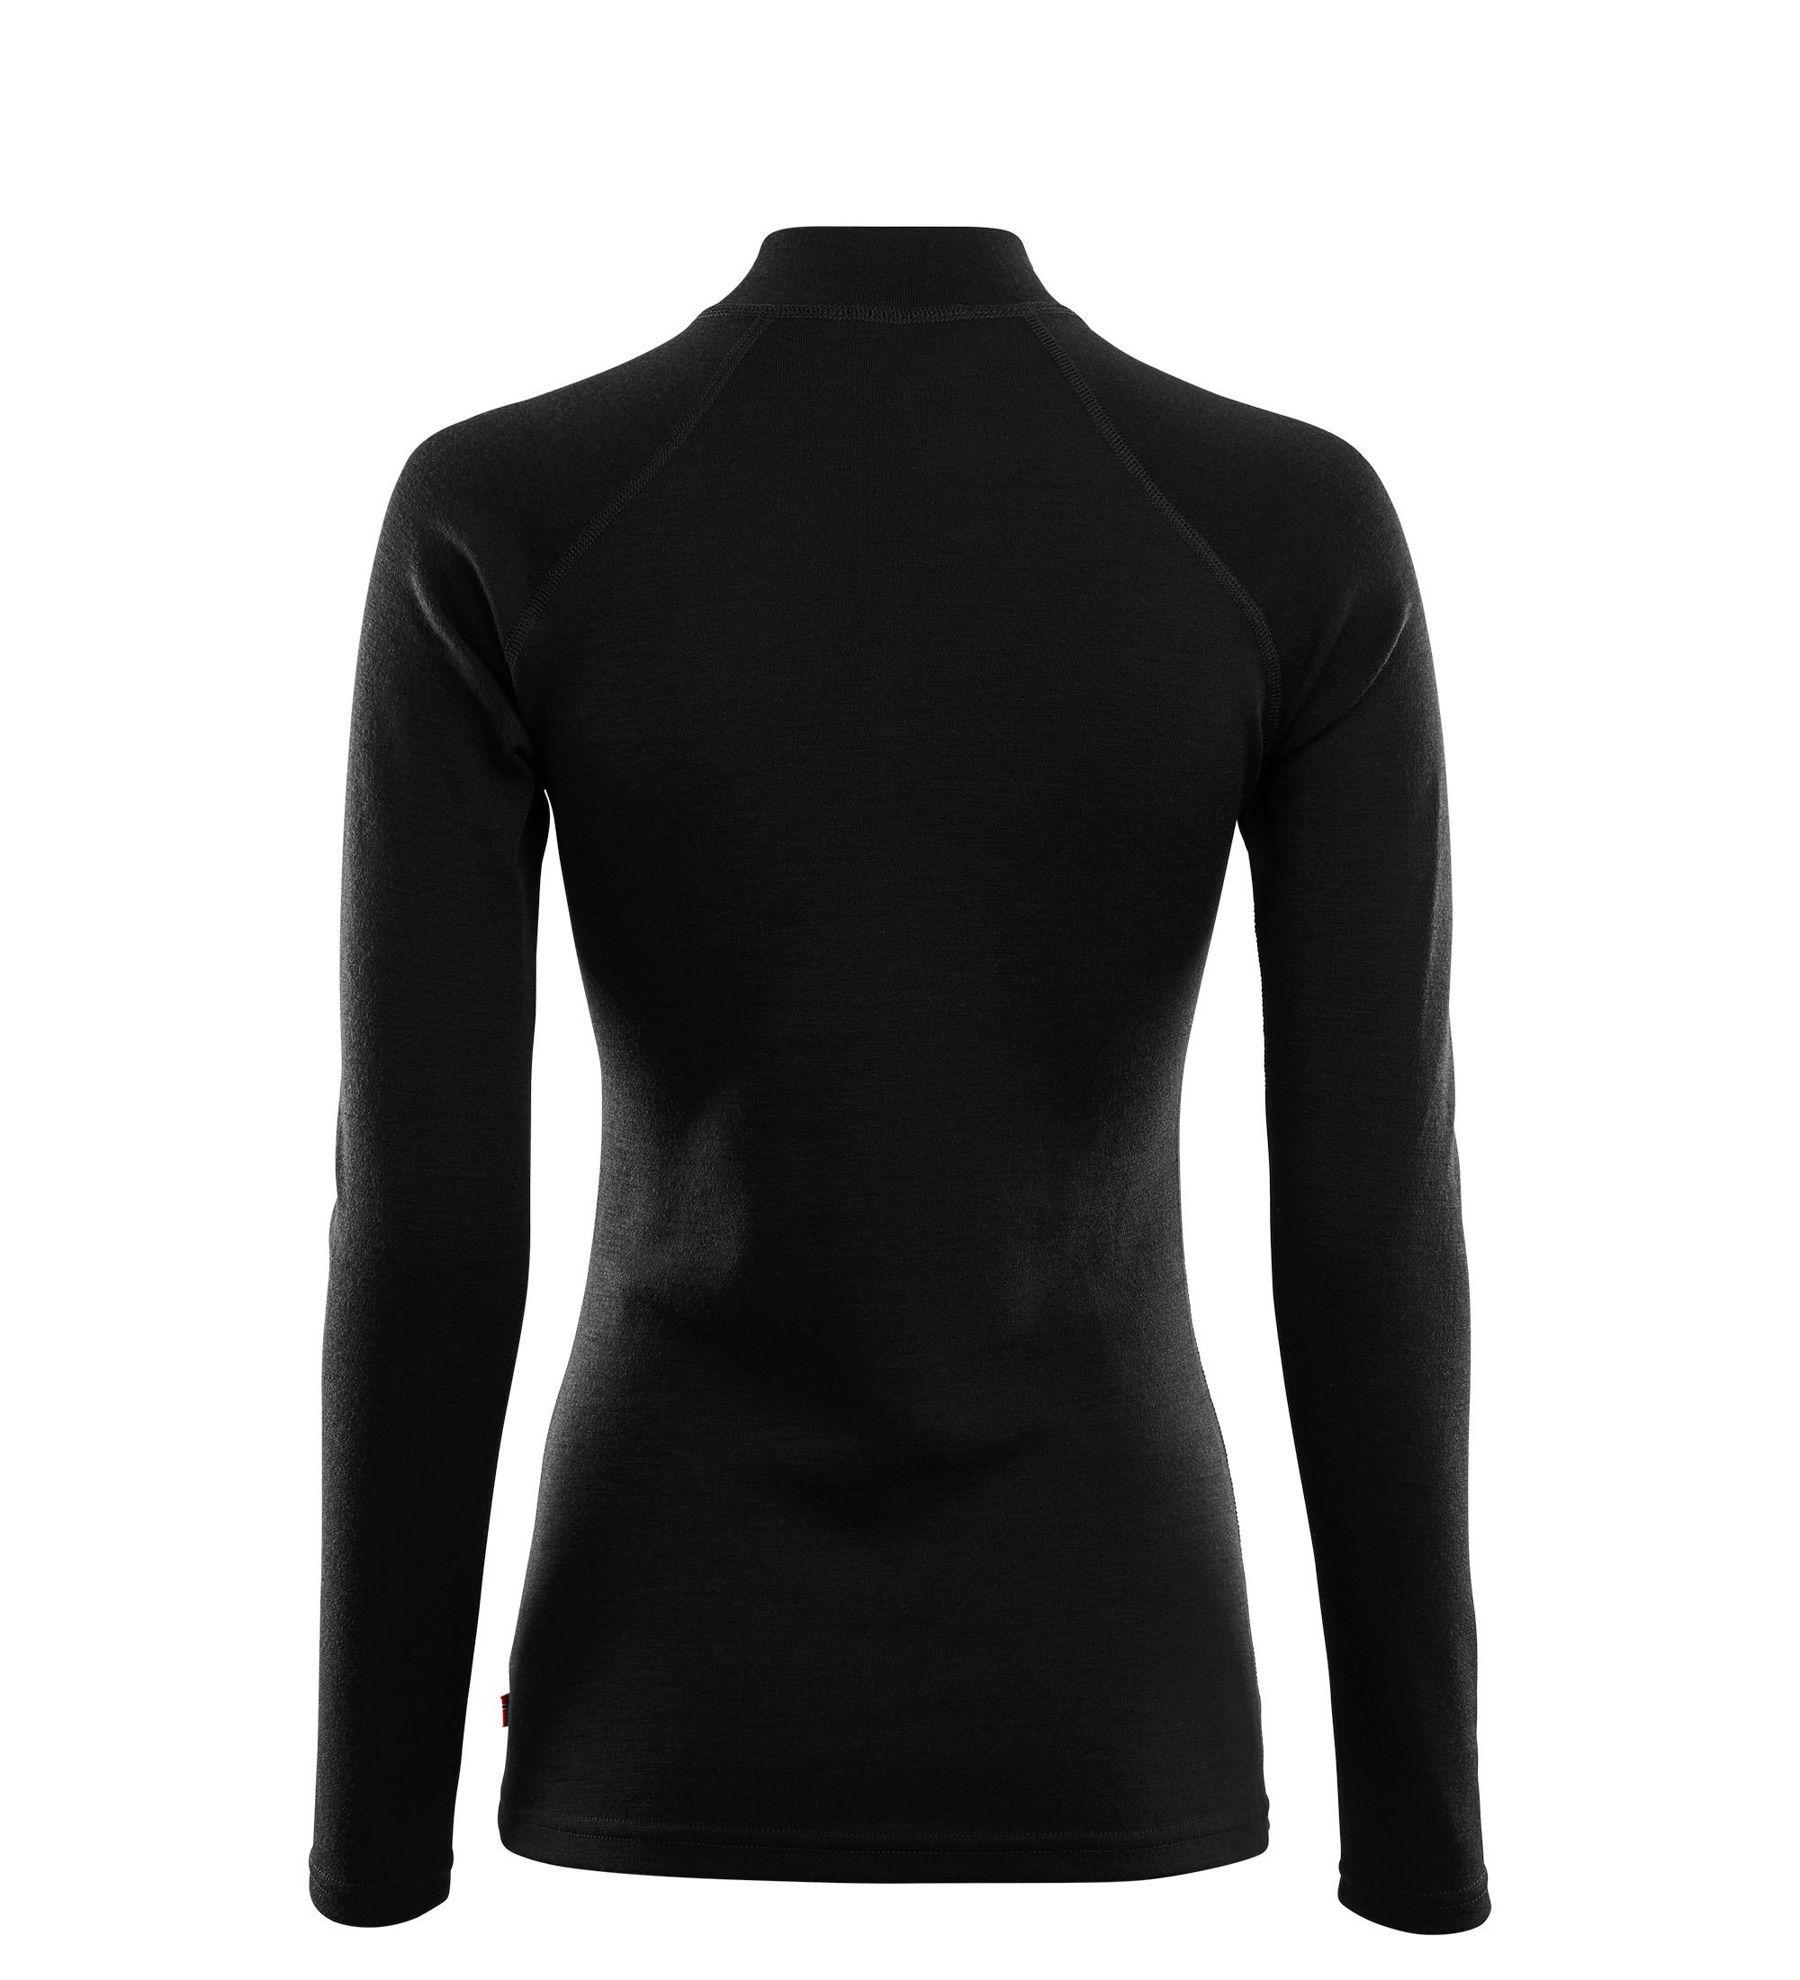 Aclima WarmWool Mock Neck shirt, Woman i Merinoull - Jet Black